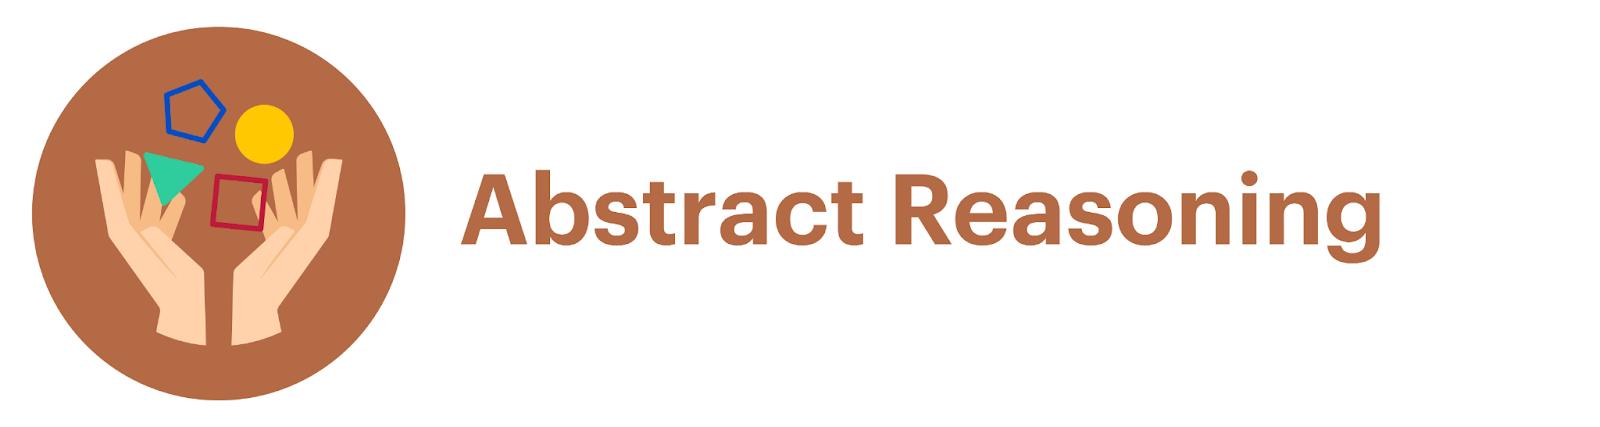 UCAT Abstract Reasoning (AR) icon.